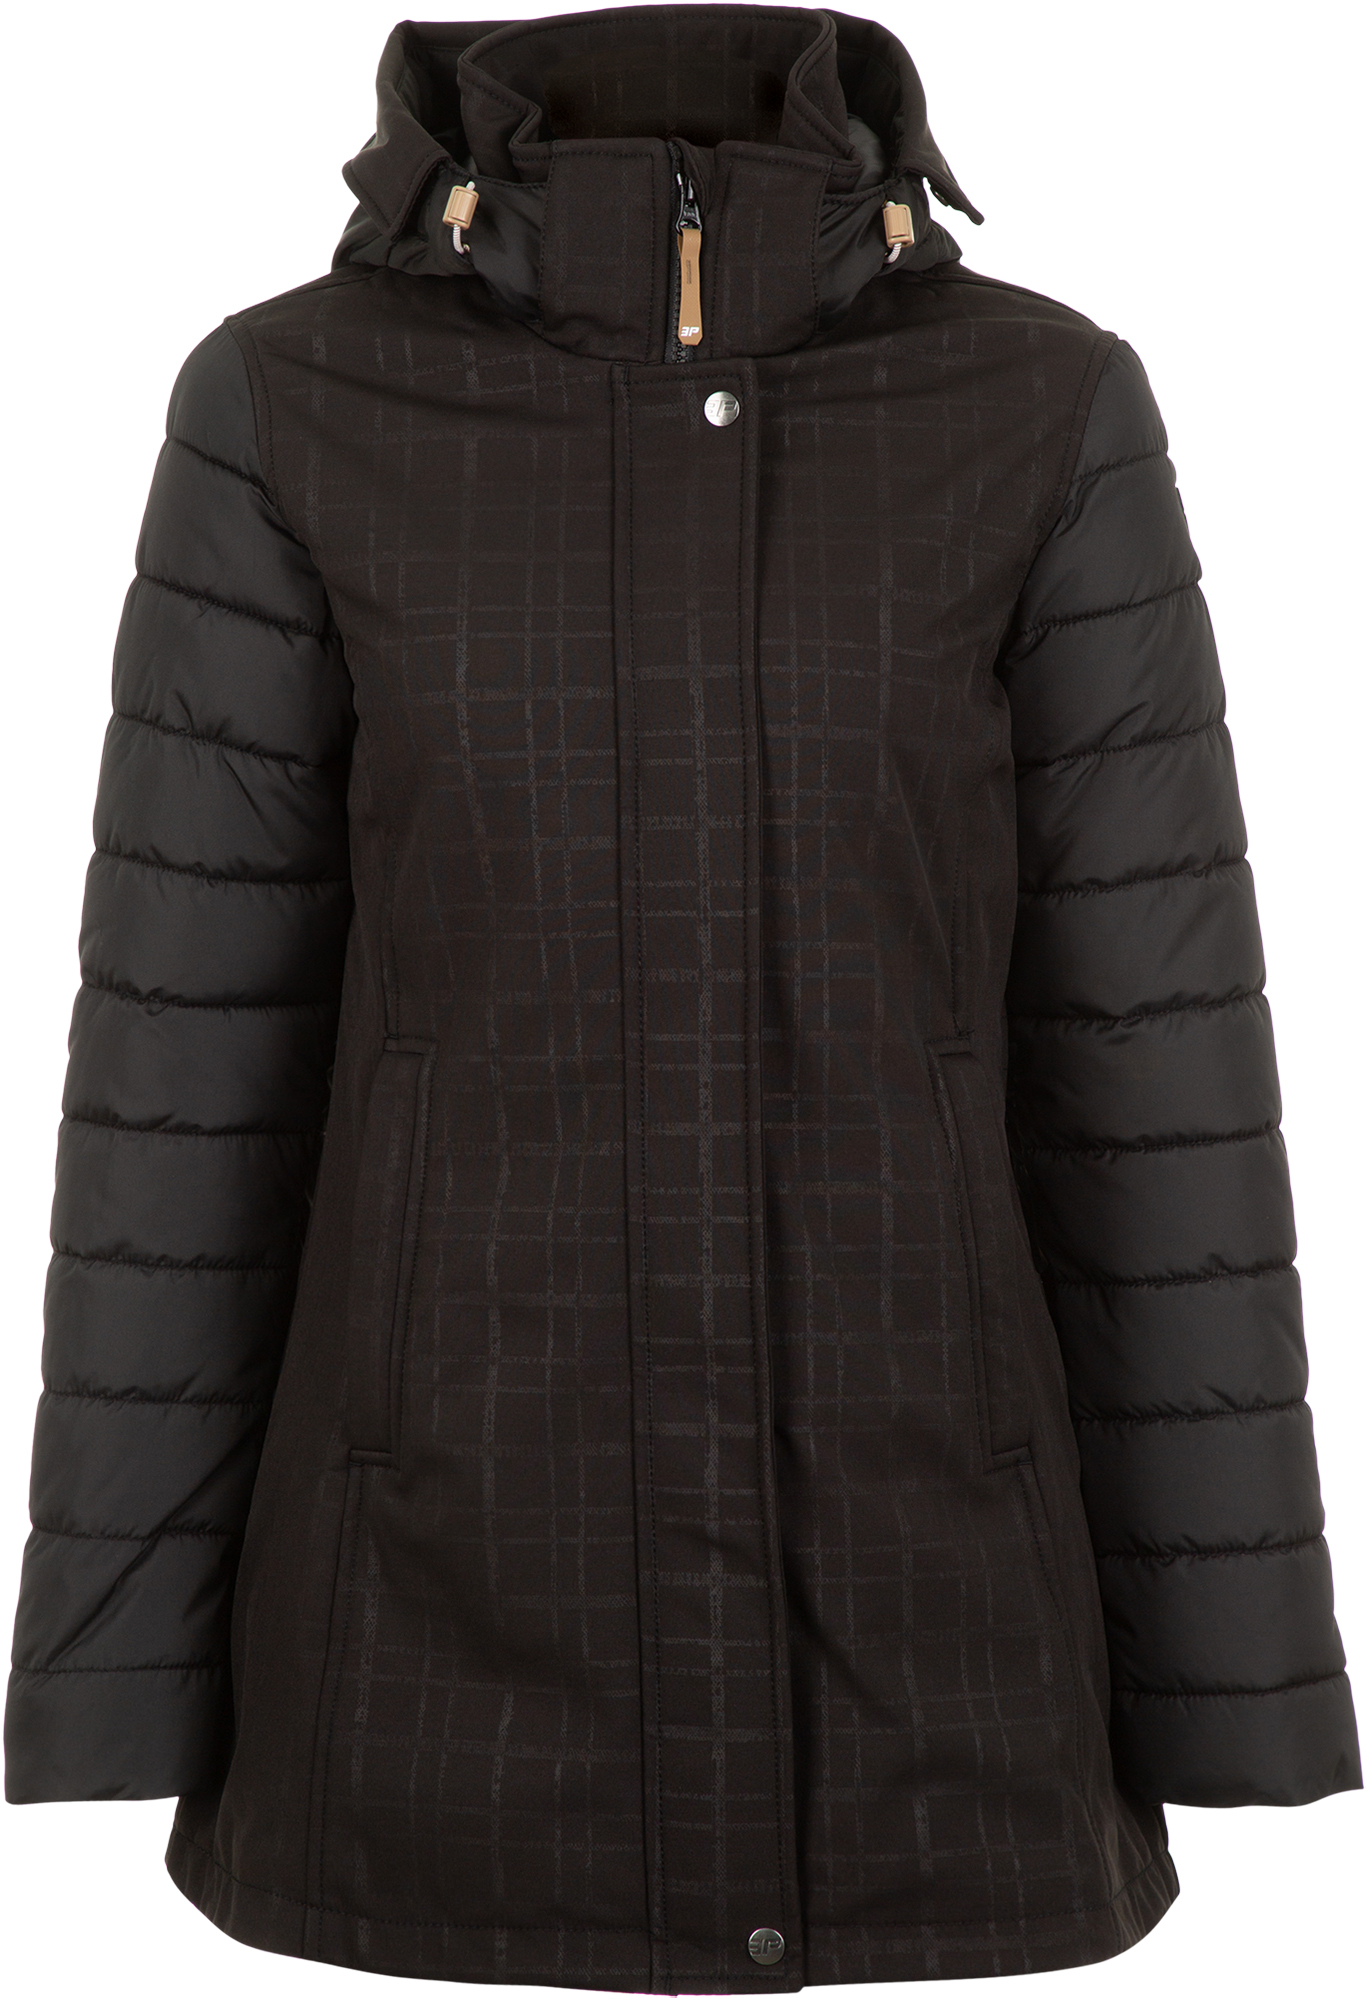 IcePeak Куртка утепленная женская IcePeak Anniston, размер 44 цены онлайн